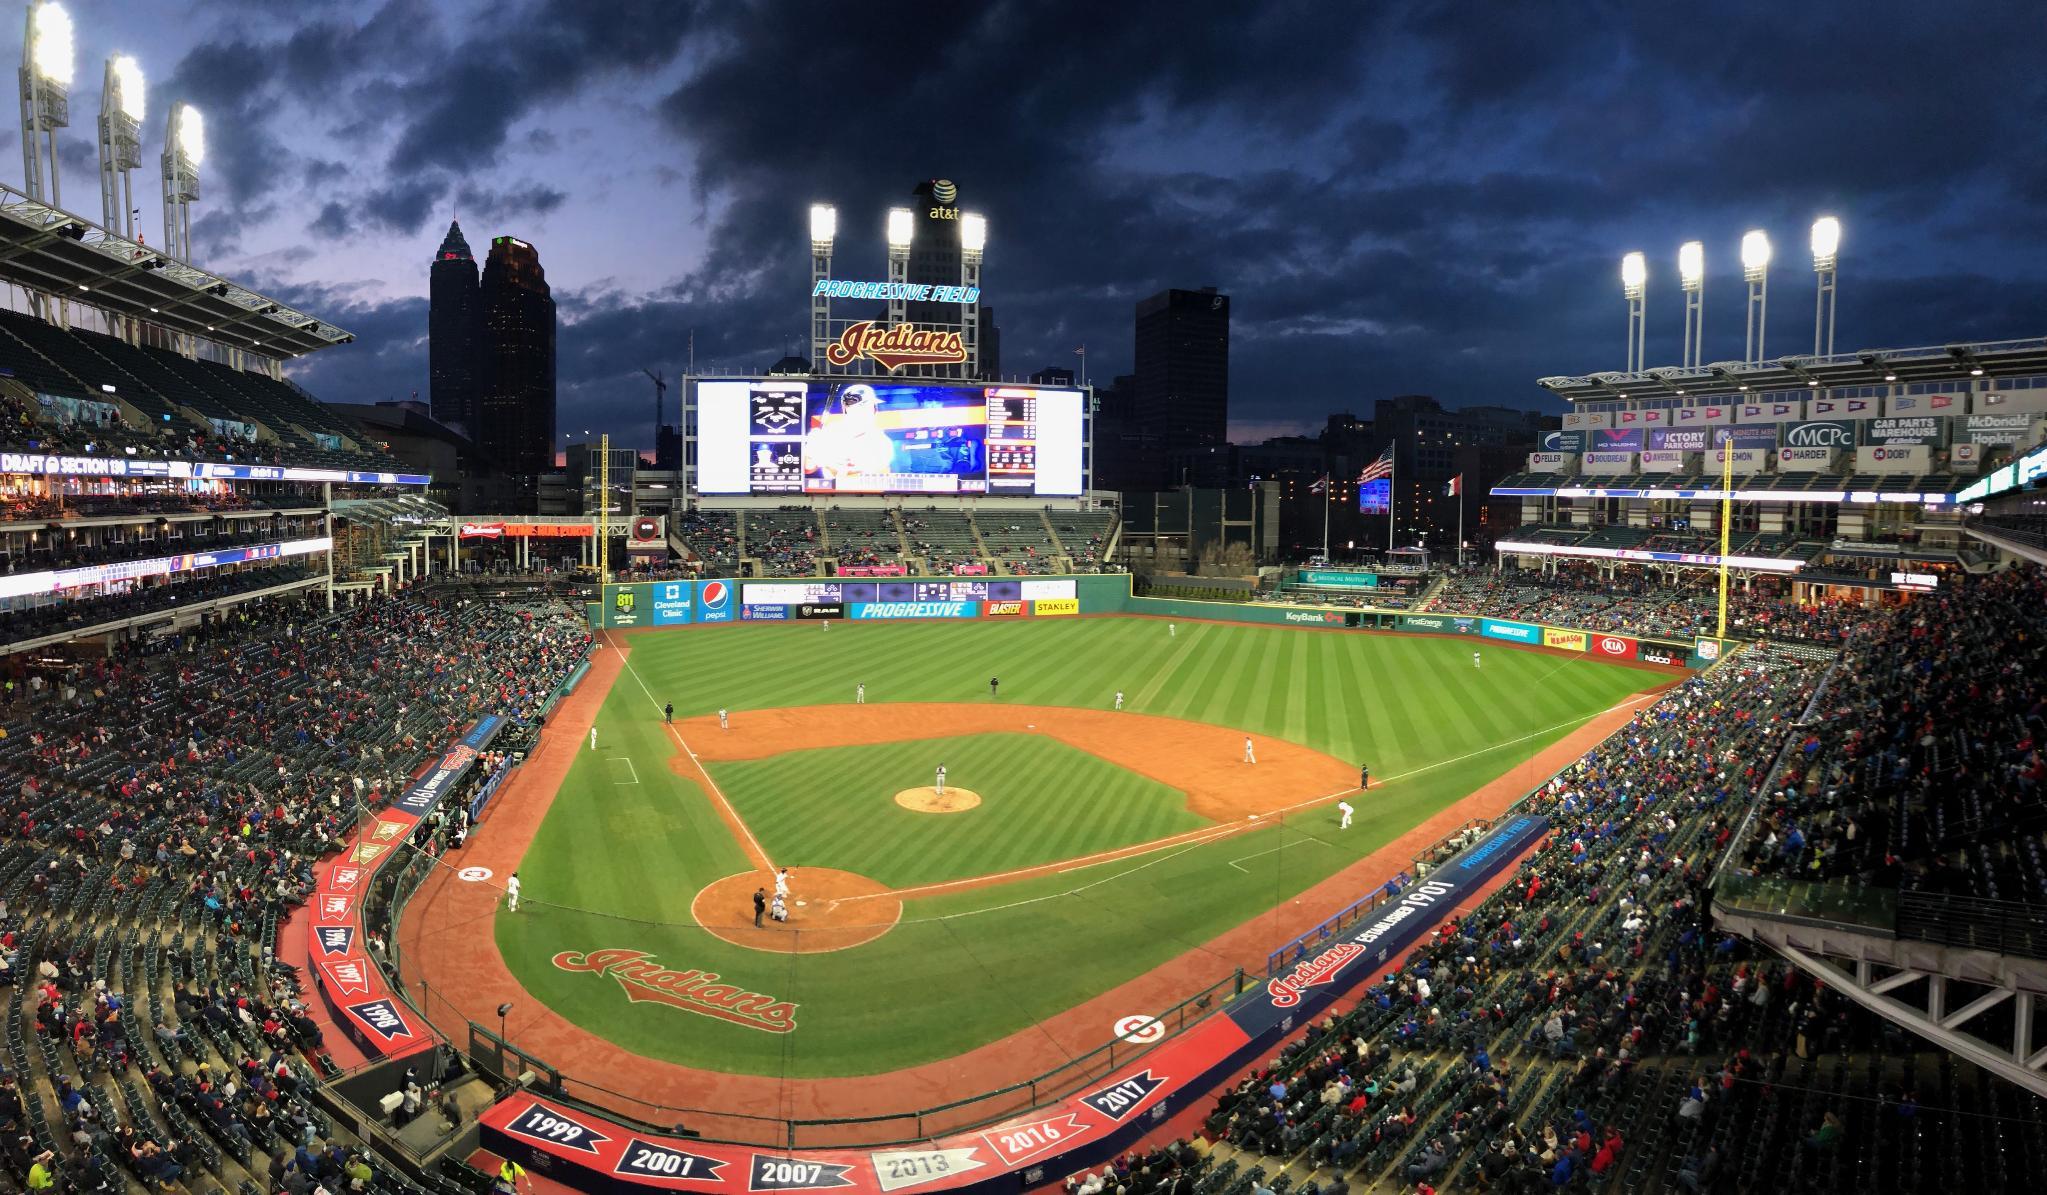 We're through six innings.  Cleveland has a 3-1 lead. https://t.co/s6NXbARRSL https://t.co/JSdG3eHhai